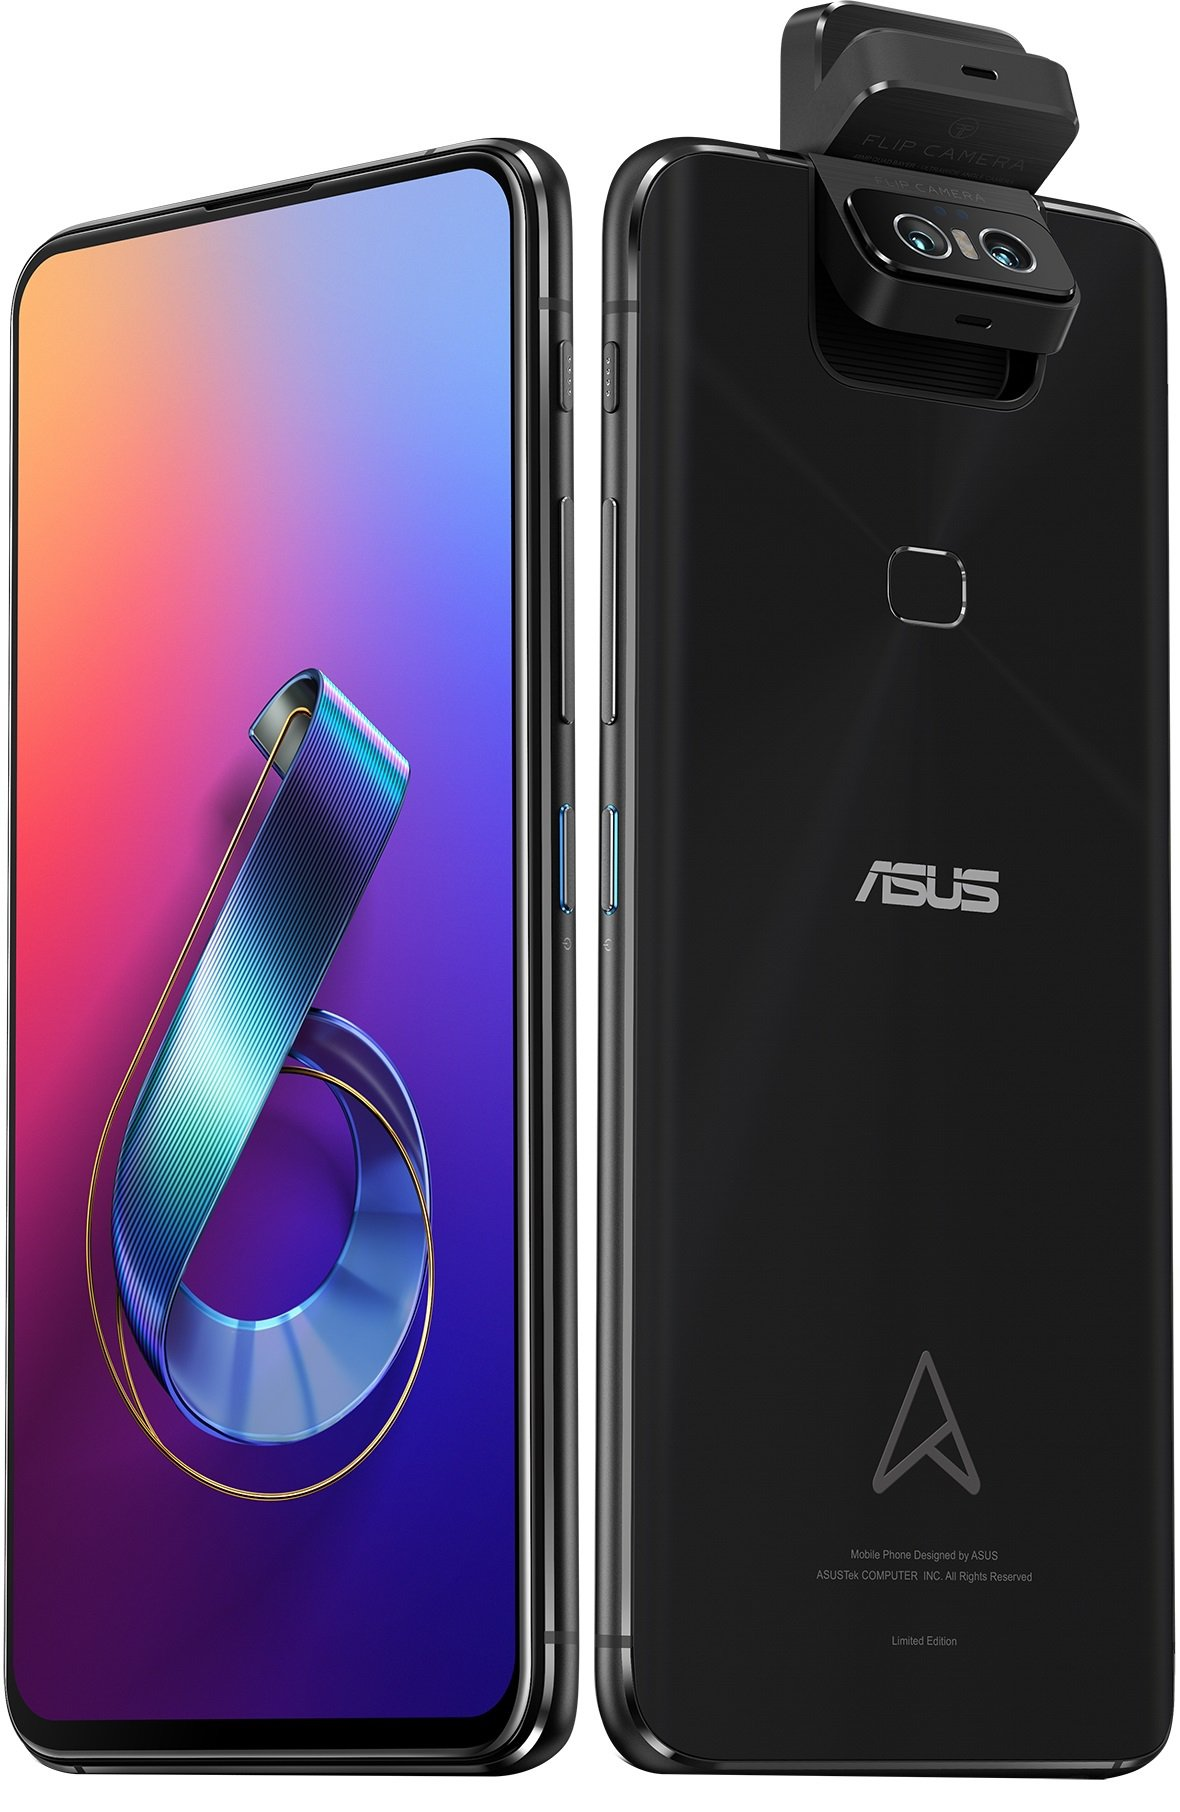 ASUS ZenFone 6 30周年限定版智慧型手機,今日搶先全球在台限量開賣...